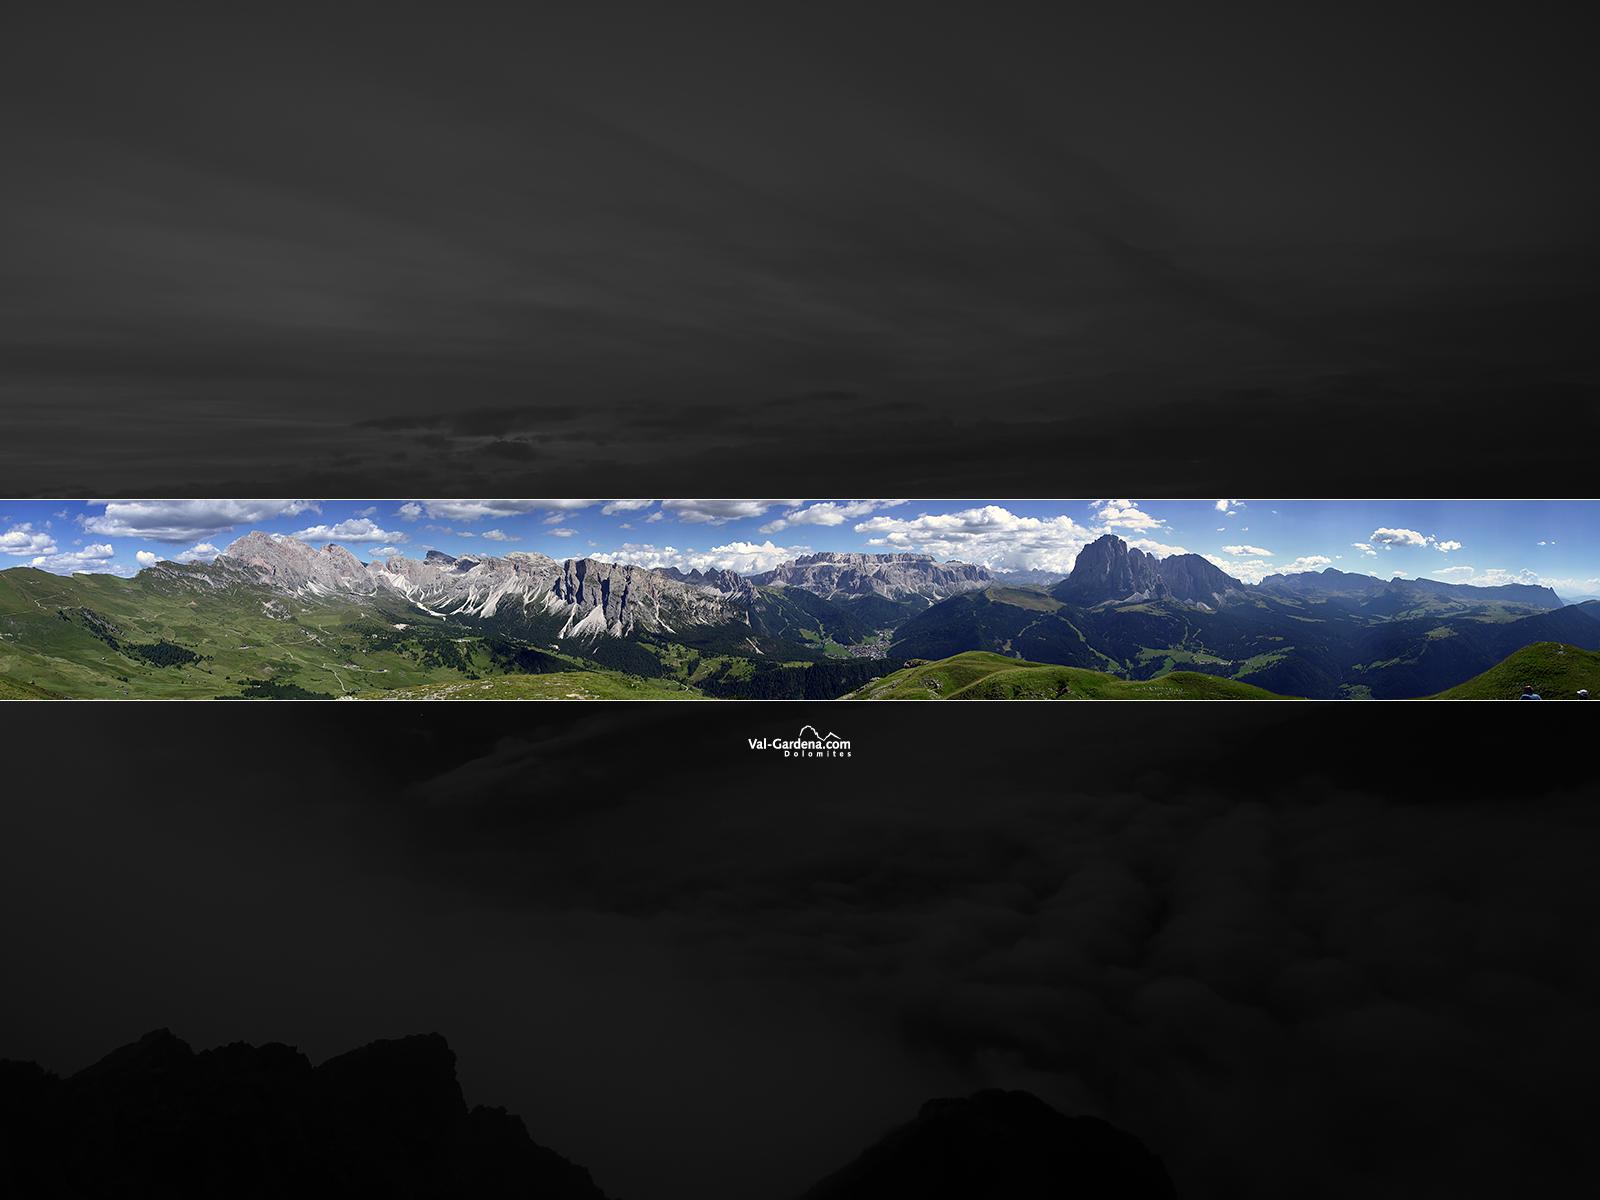 Wallpaper of Dolomites Val Gardena   Desktop Images Val Gardena 1600x1200